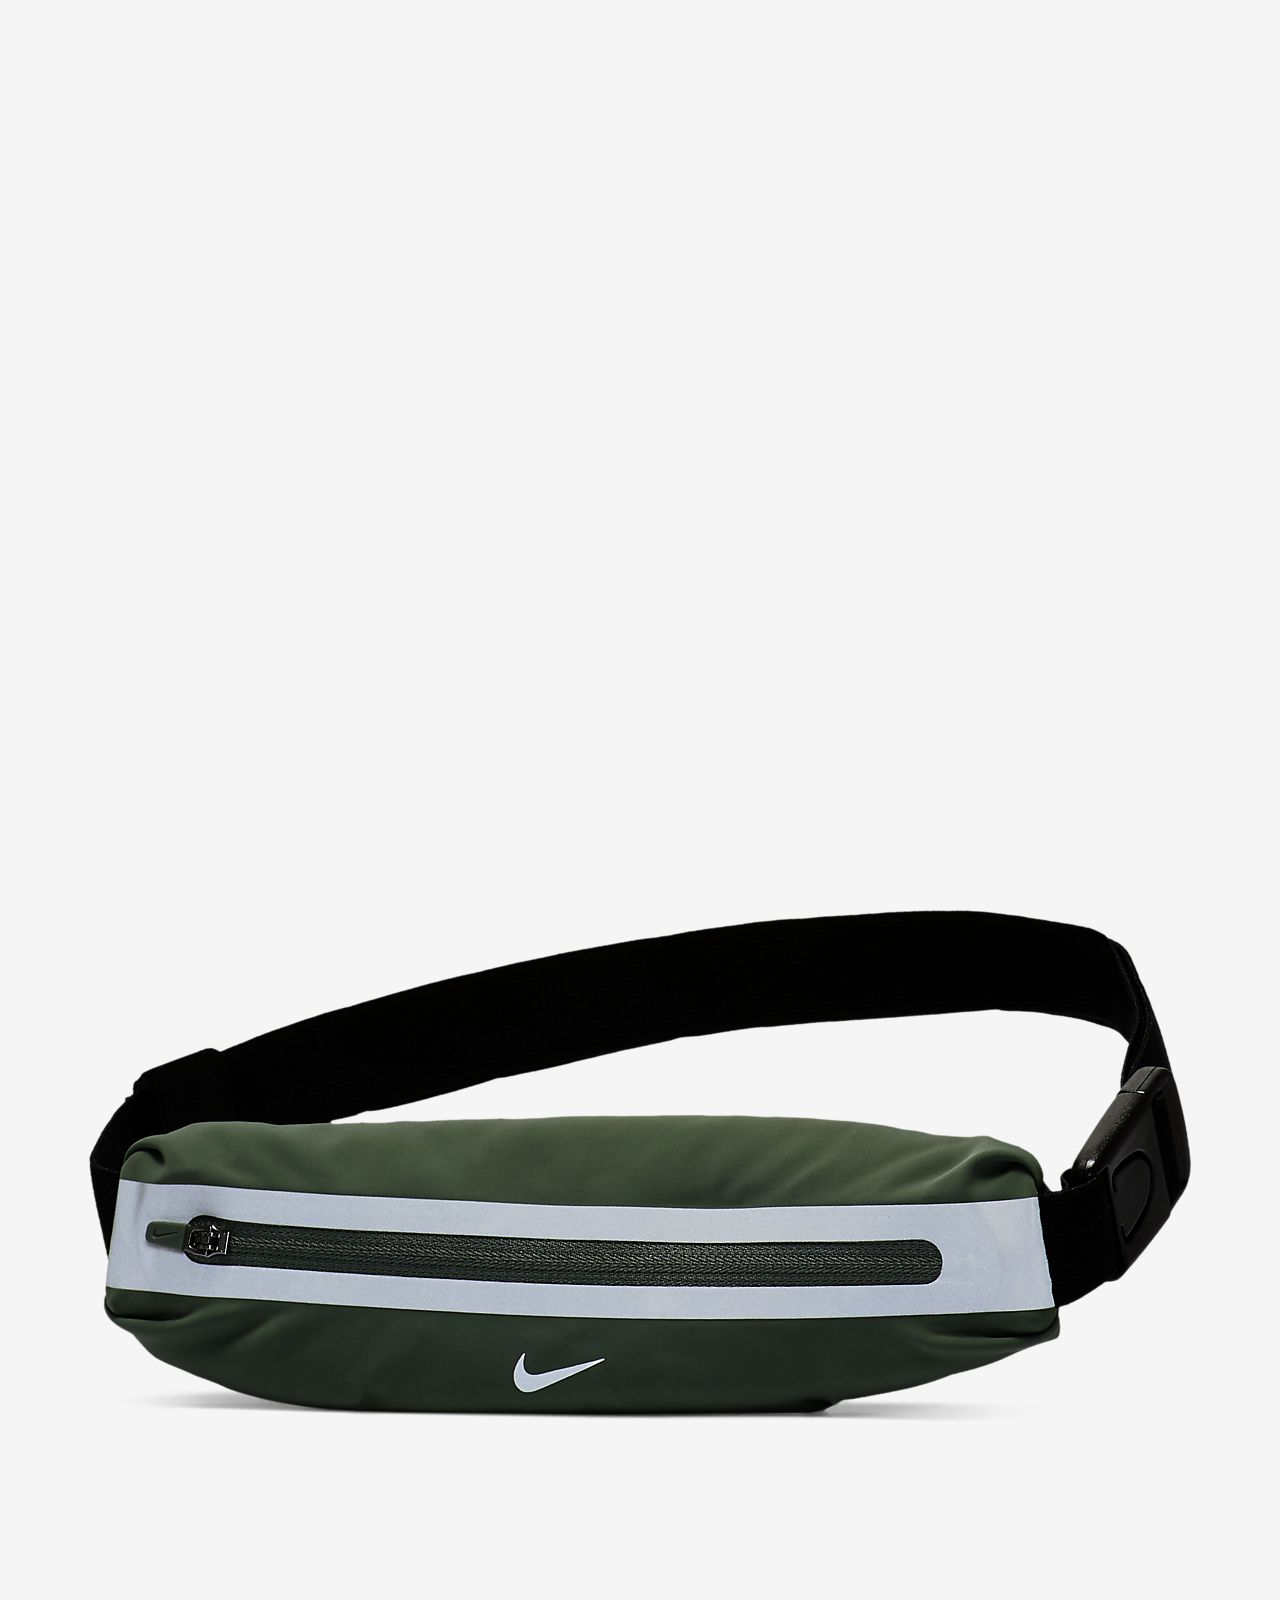 Nike Slim Fanny Pack